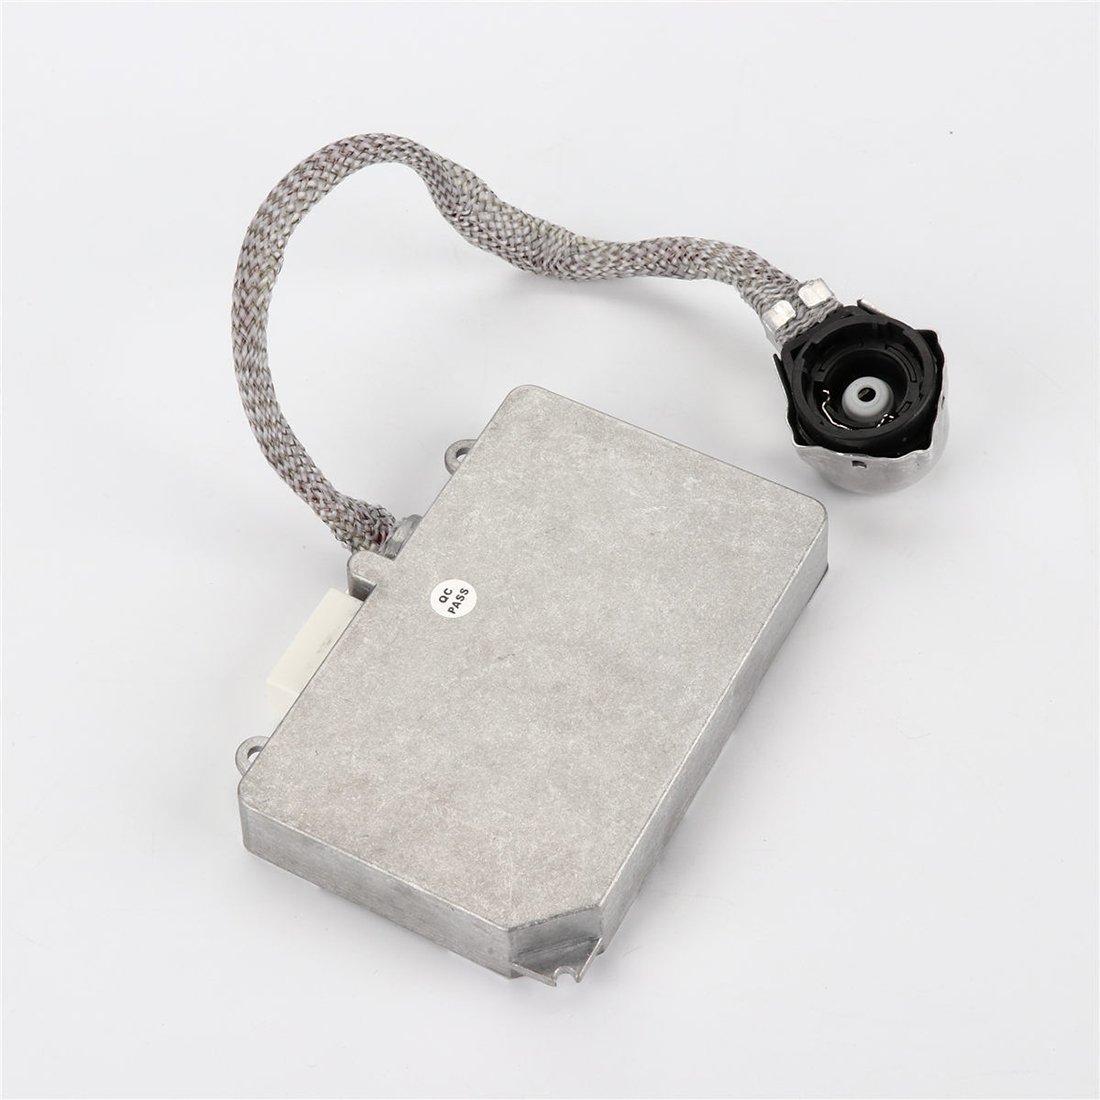 D2S D2R Xenon HID Headlight Ballast Igniter Koito for Toyota Lexus ES GS is LS Mazda 6 85967-30050,85967-08010,85967-50020,39000-76943,3900076943